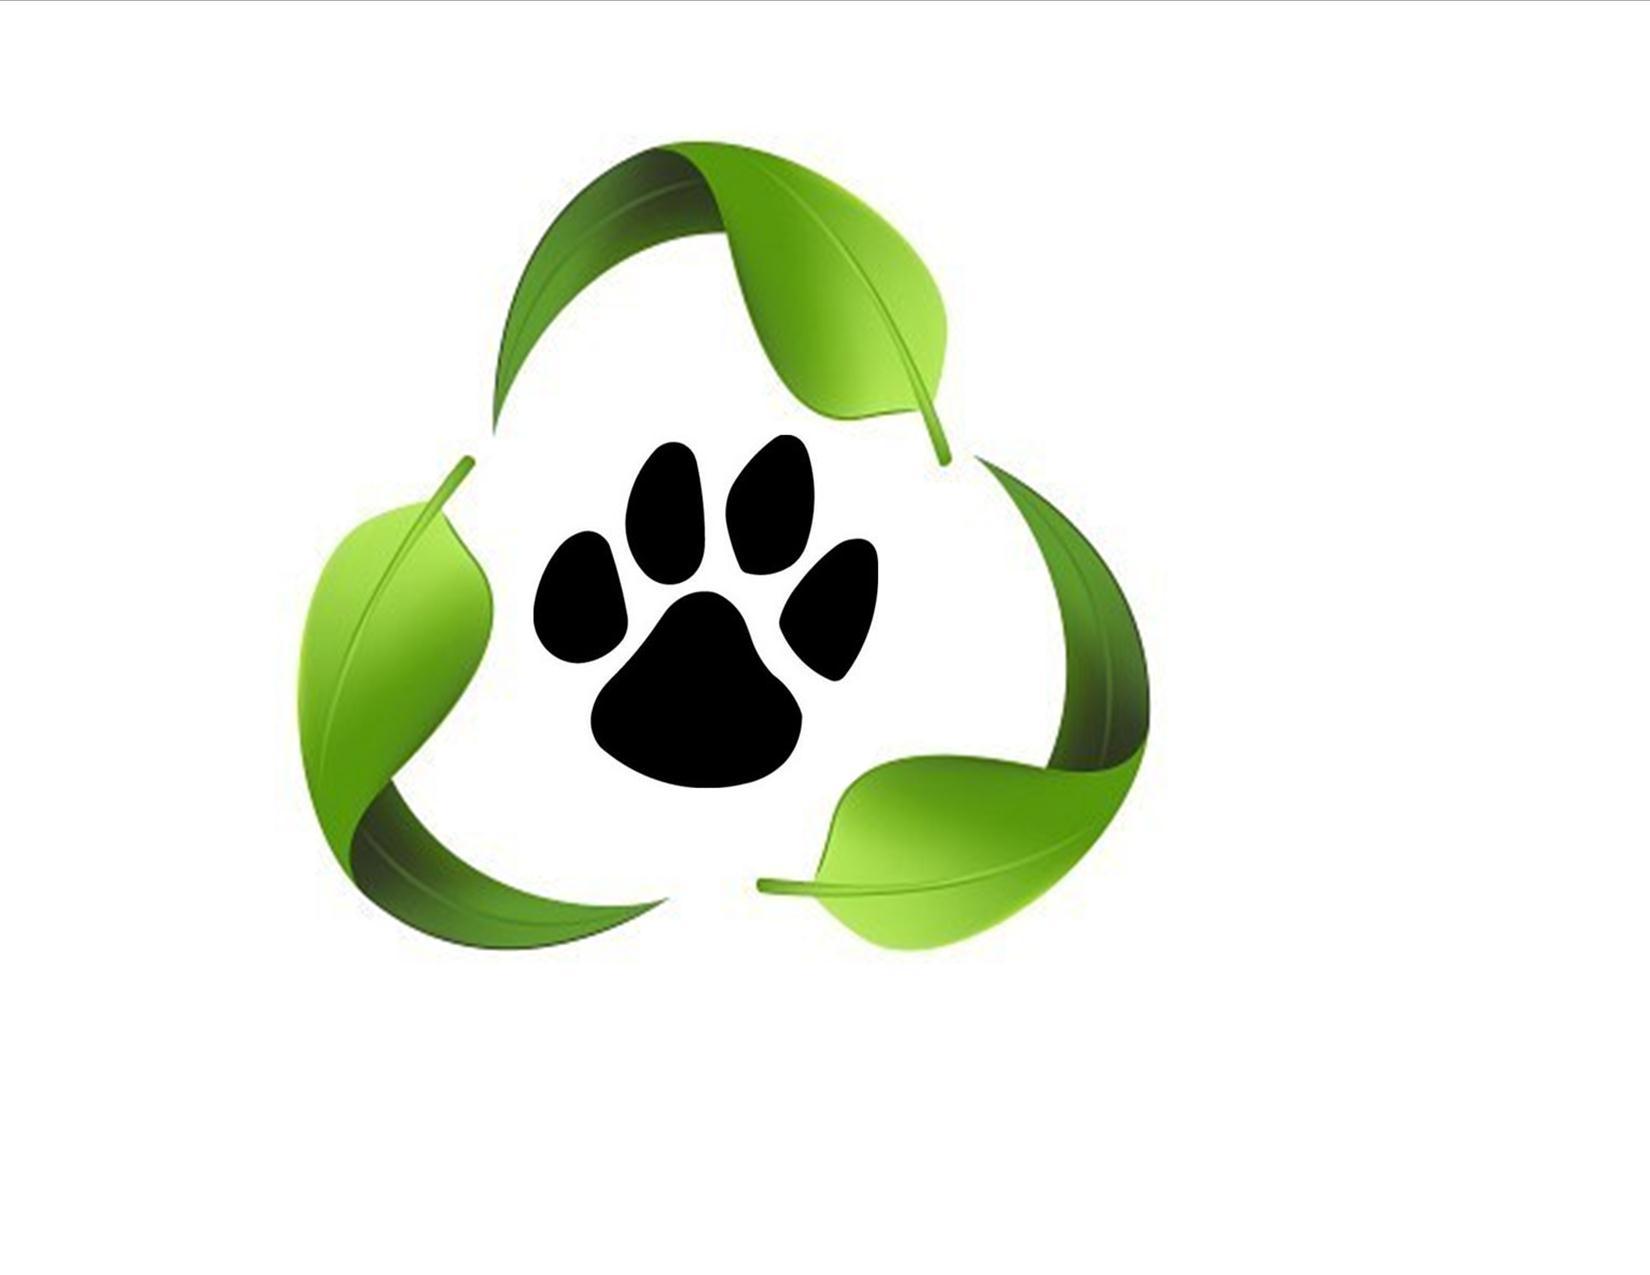 Recycle Leaf And Paw Ecodaisy Orthopedic Dog Mattresses